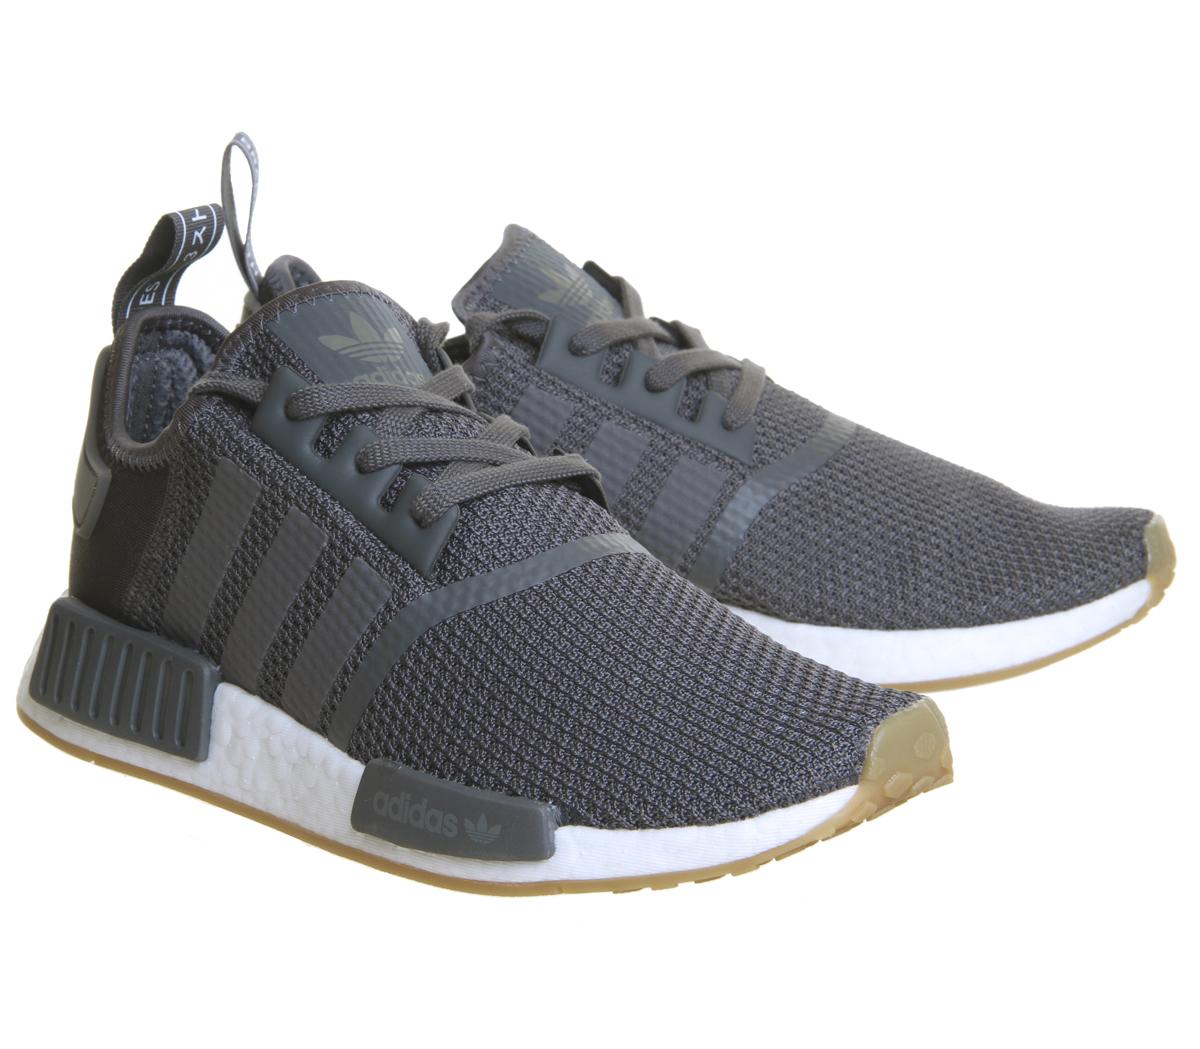 Adidas NBA EA Sports Retro Rare Trainers Baskets Baskets Trainers chaussures